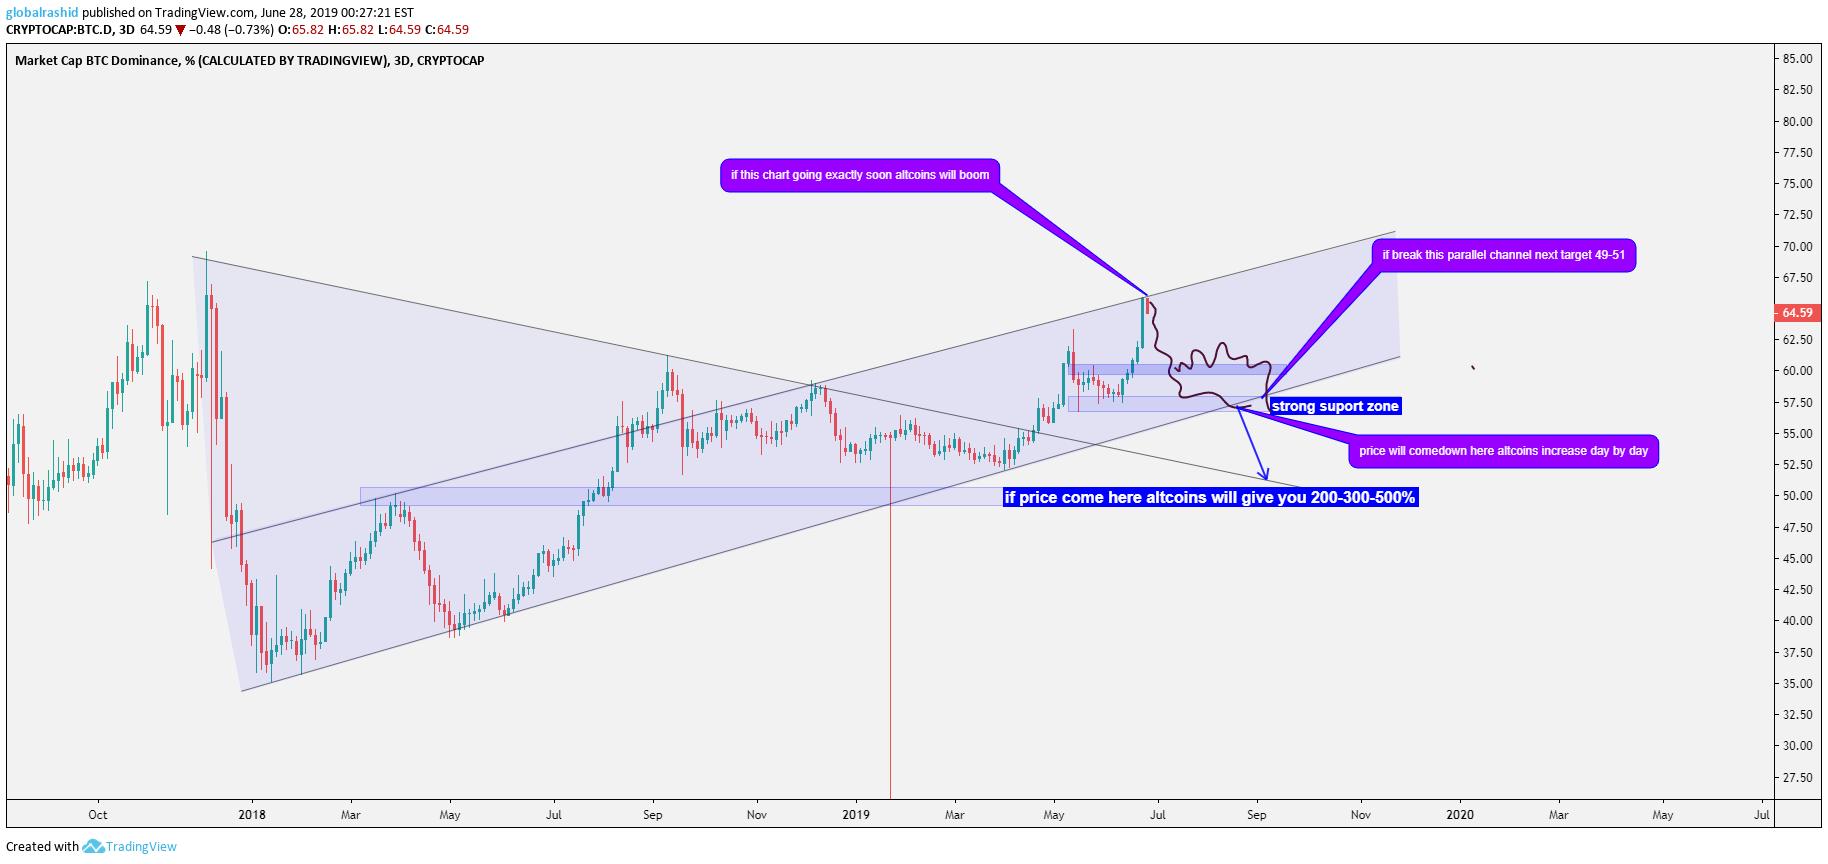 Altcoin market dominance tradingview